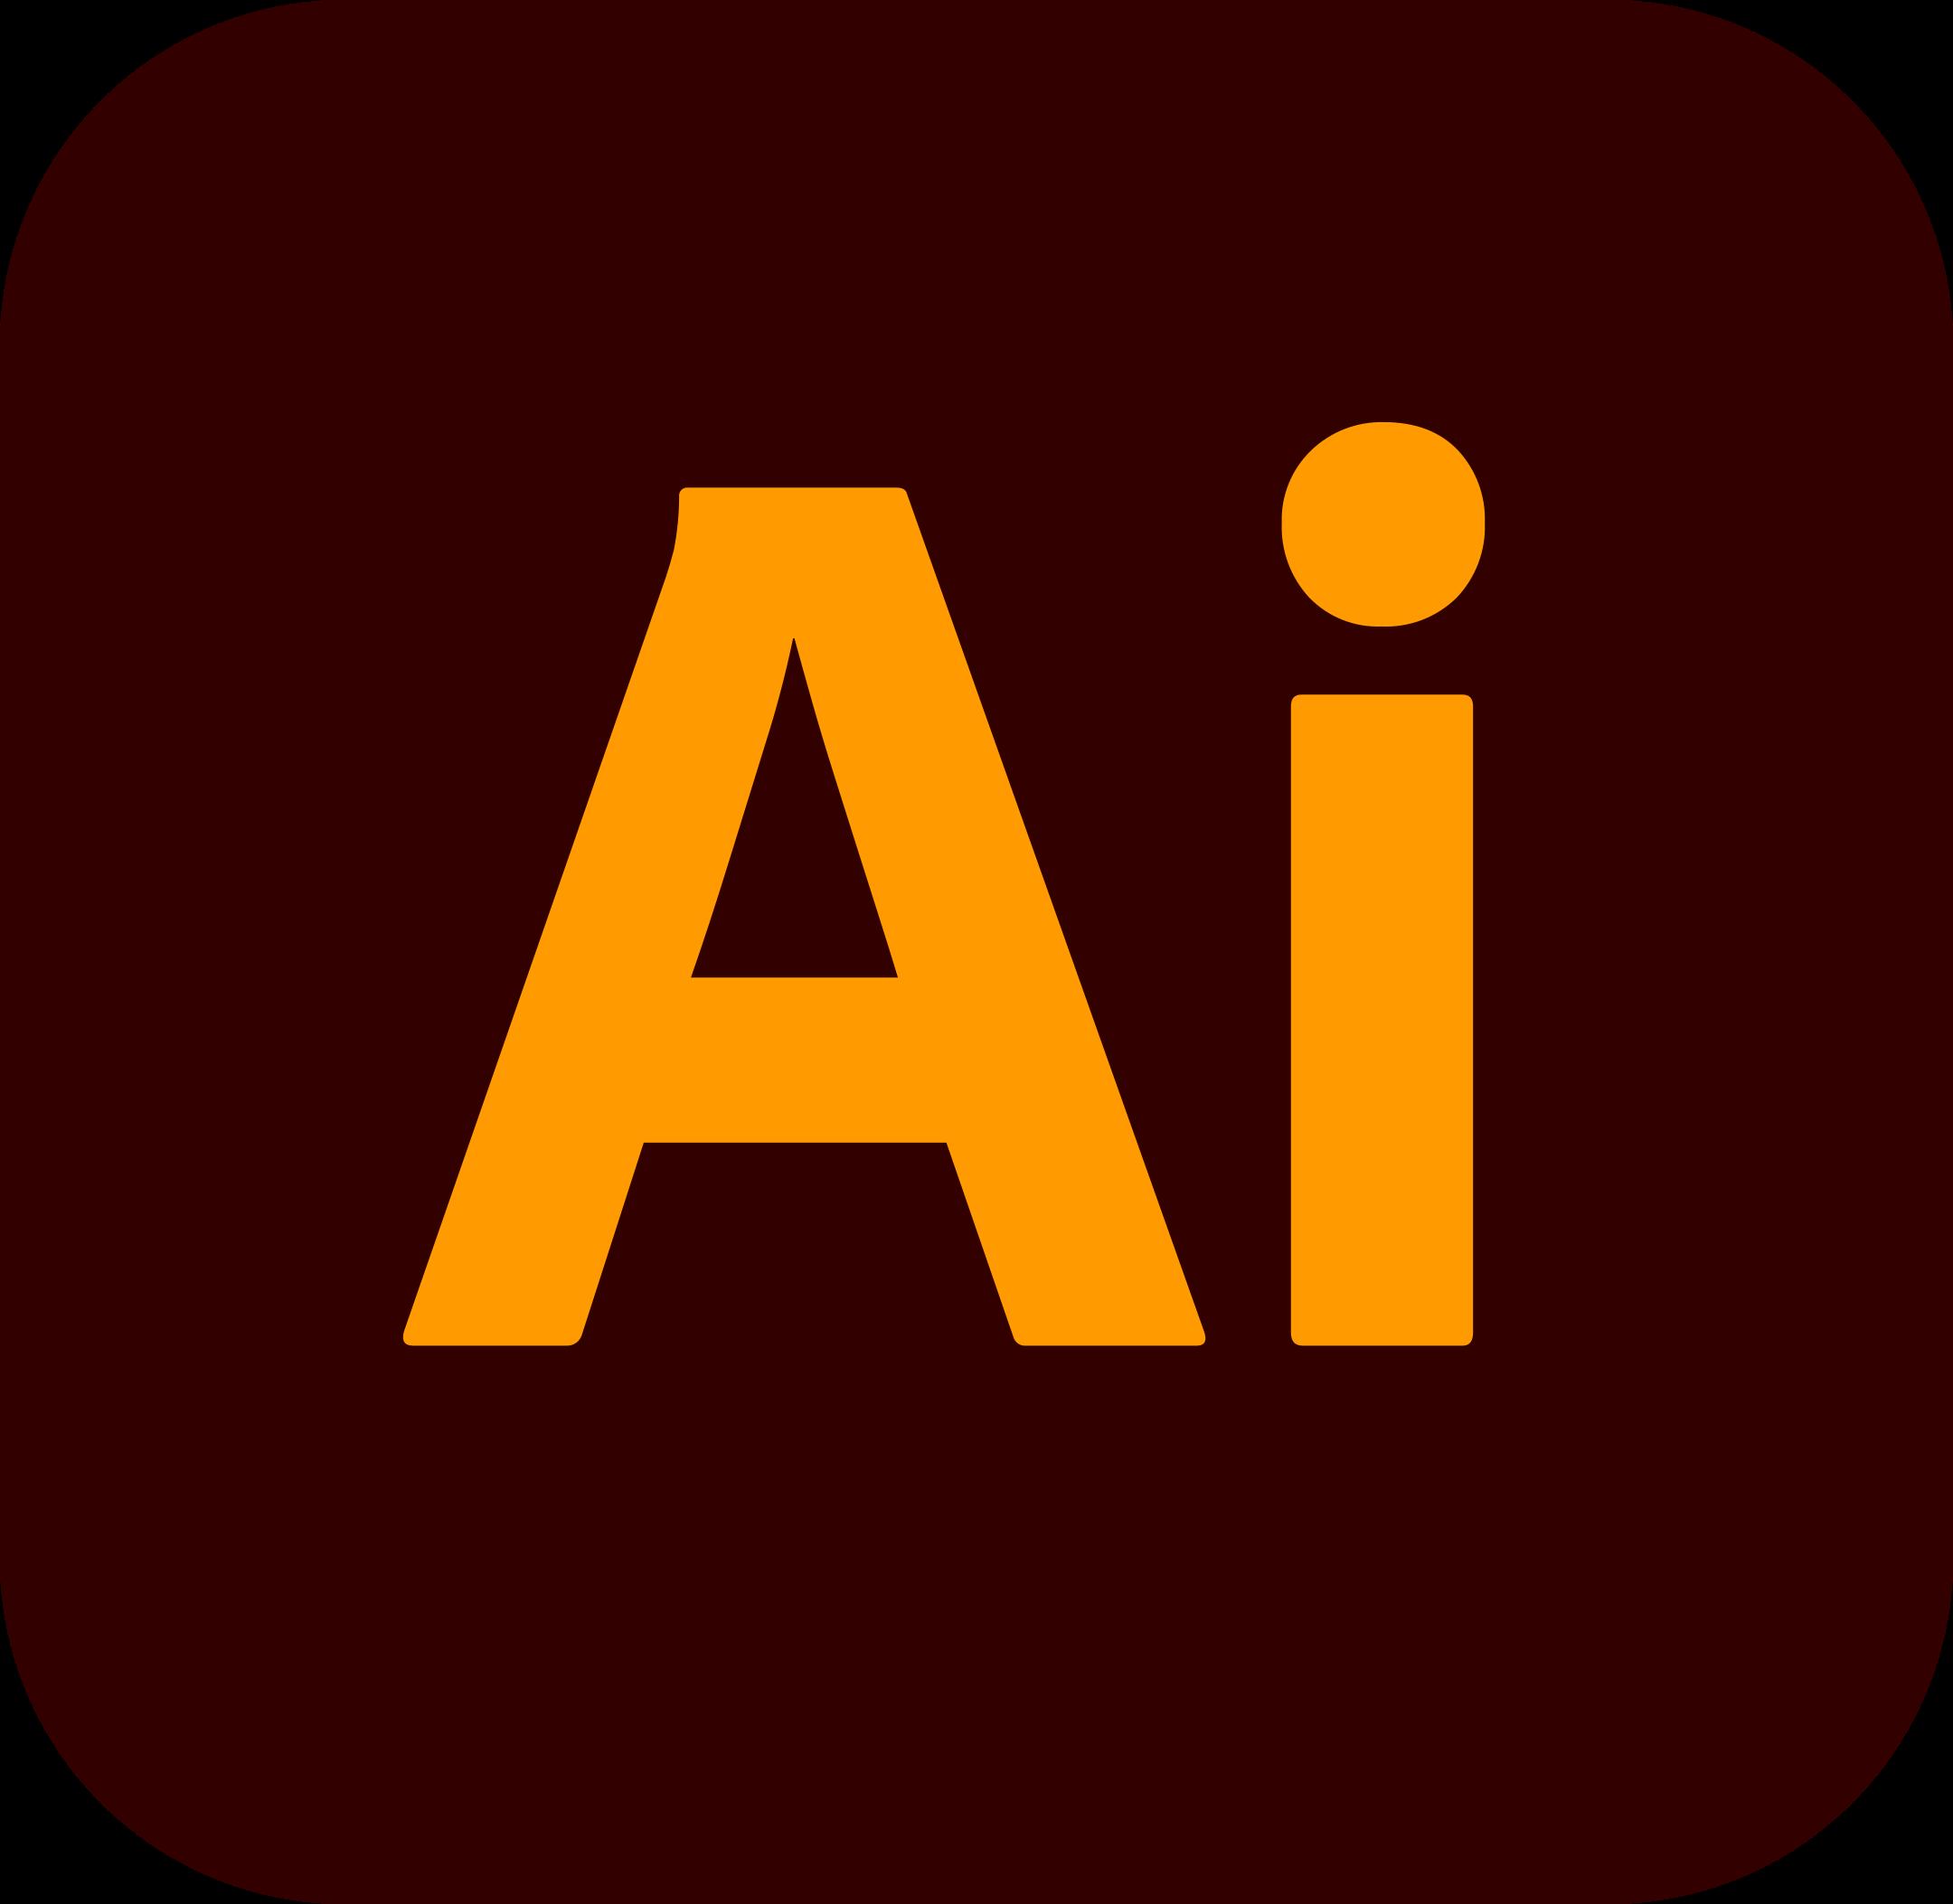 adobe Illustrator logo 1 1 - Adobe Illustrator Logo